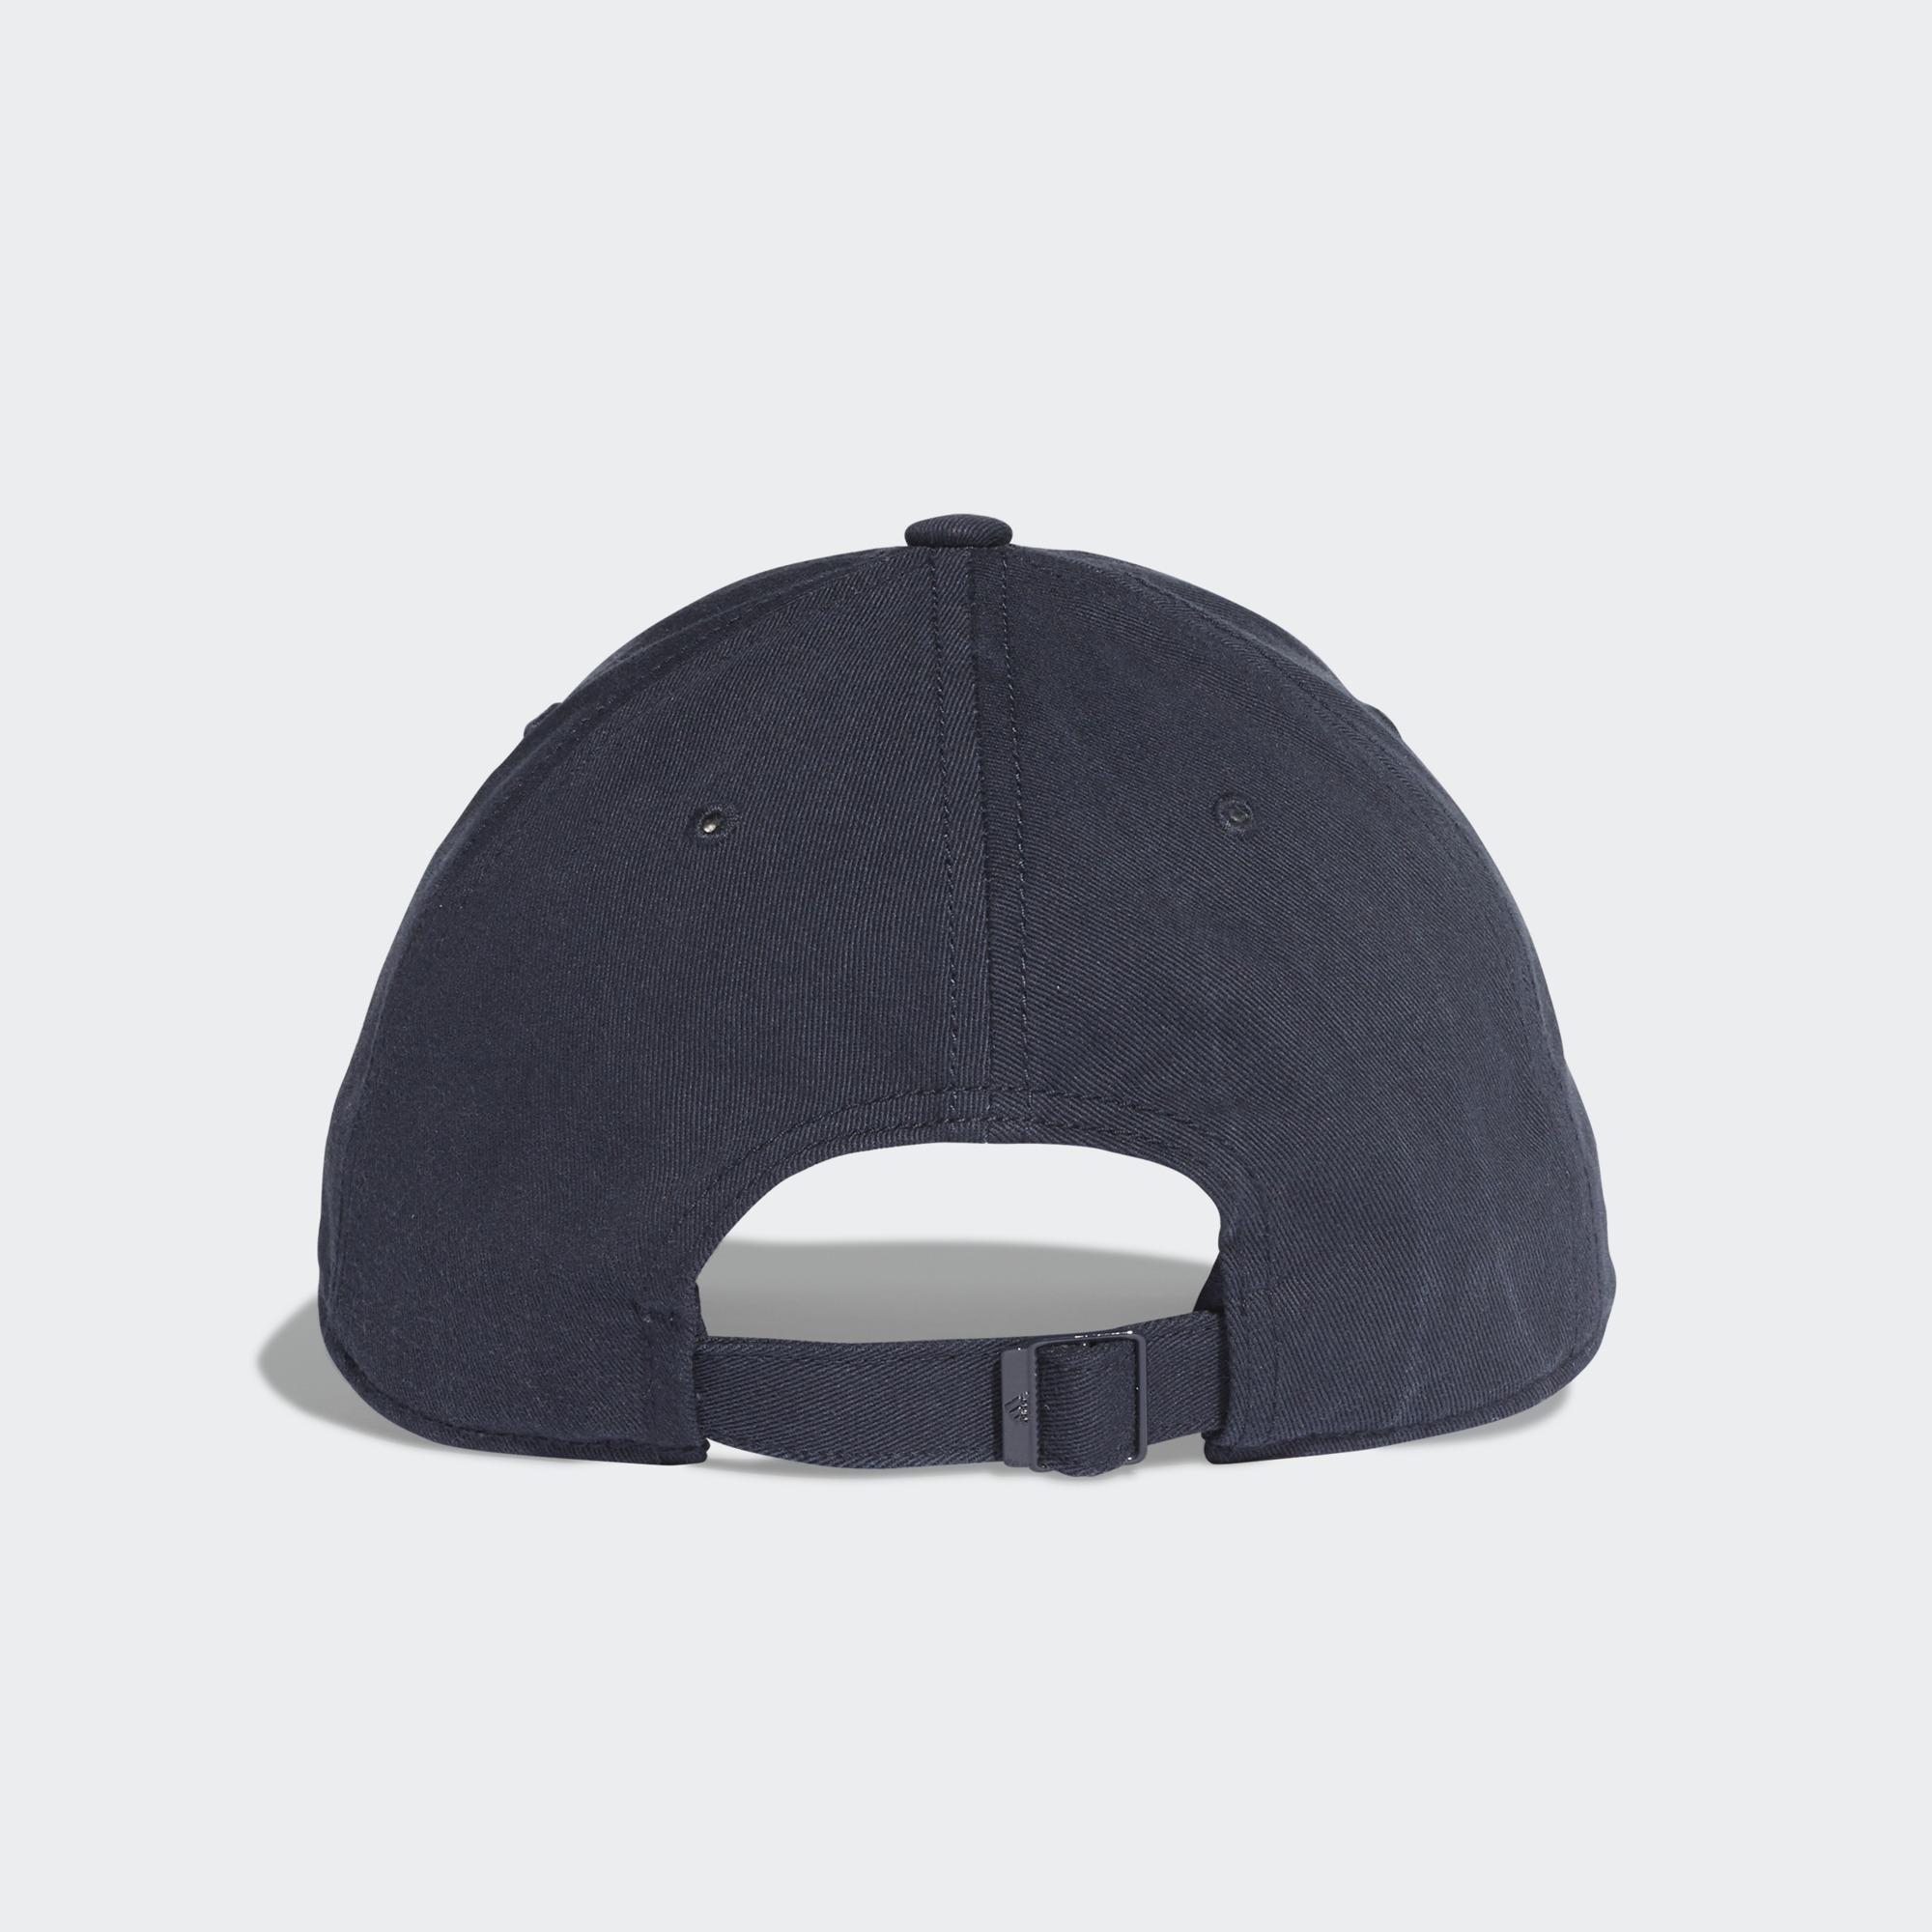 [ALPHA] ADIDAS CLASSIC SIX PANEL CAP DT8563 老帽 電繡 深藍